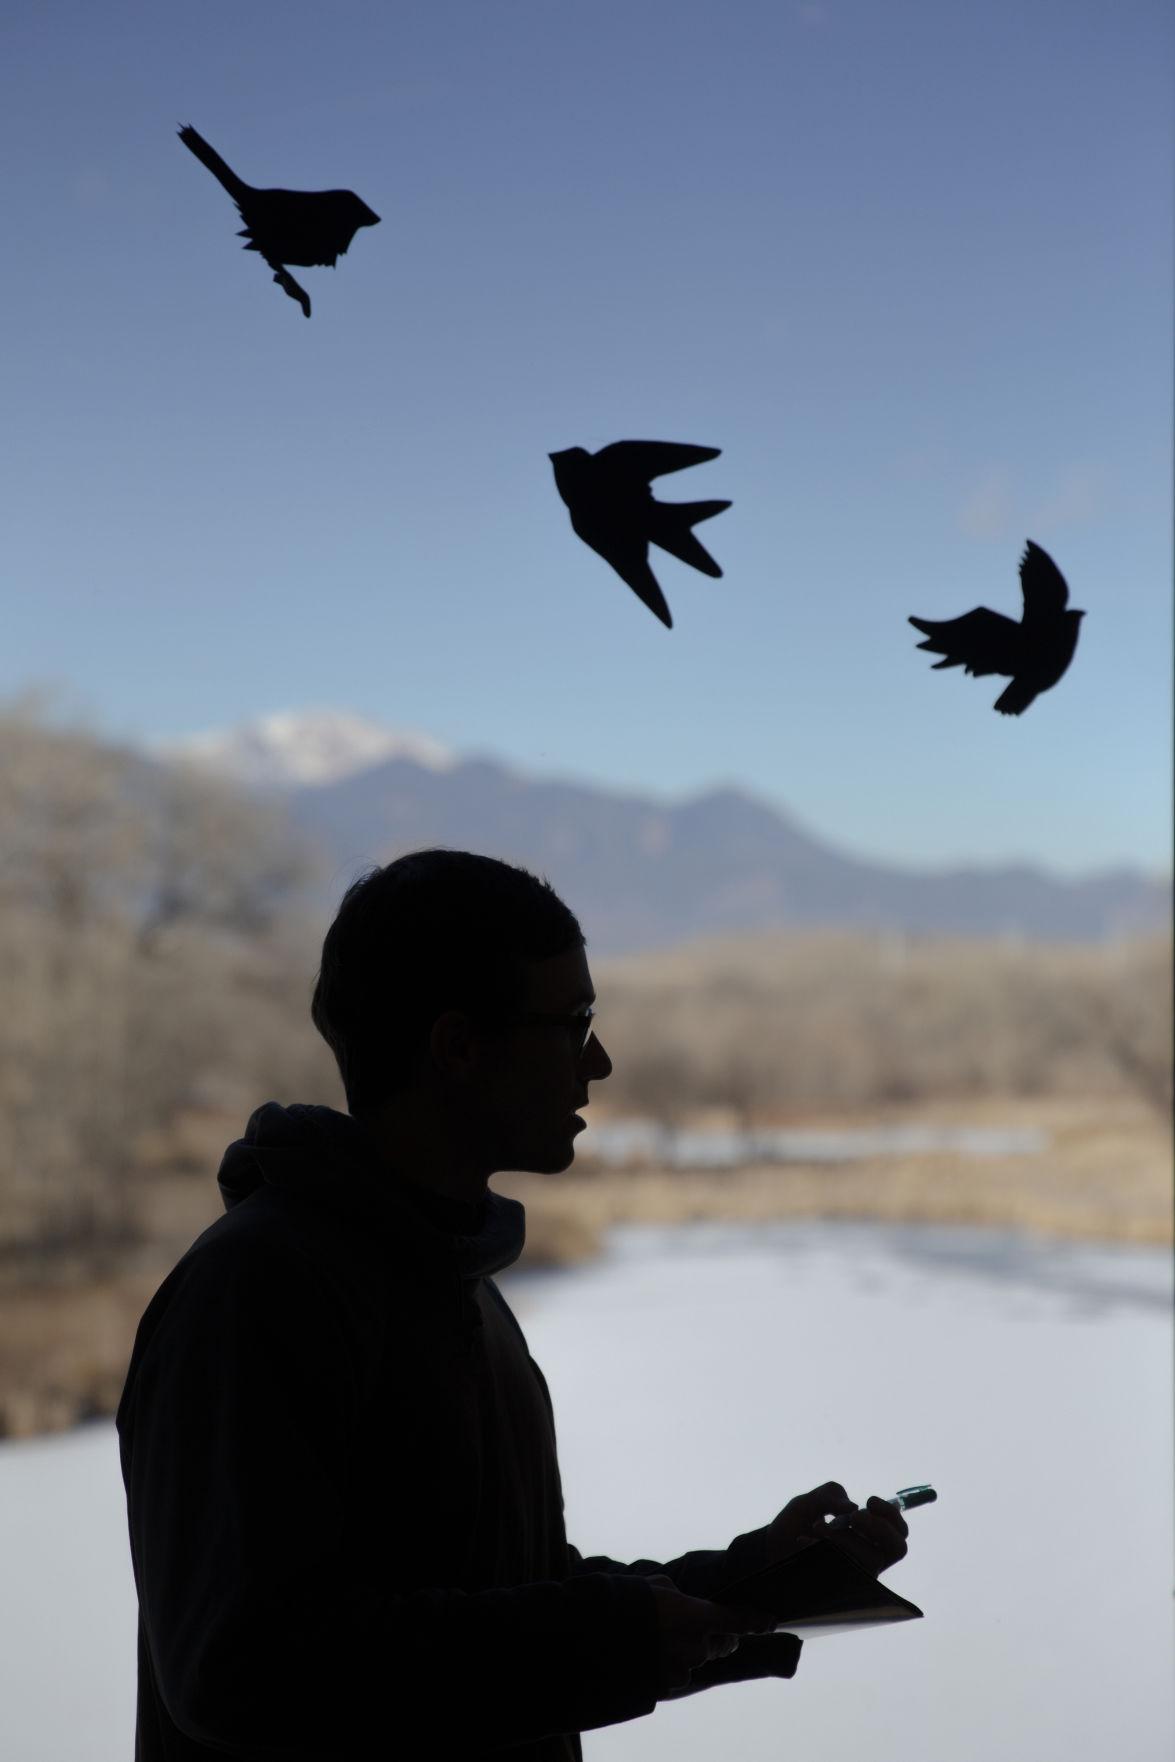 011220-news-birds 02